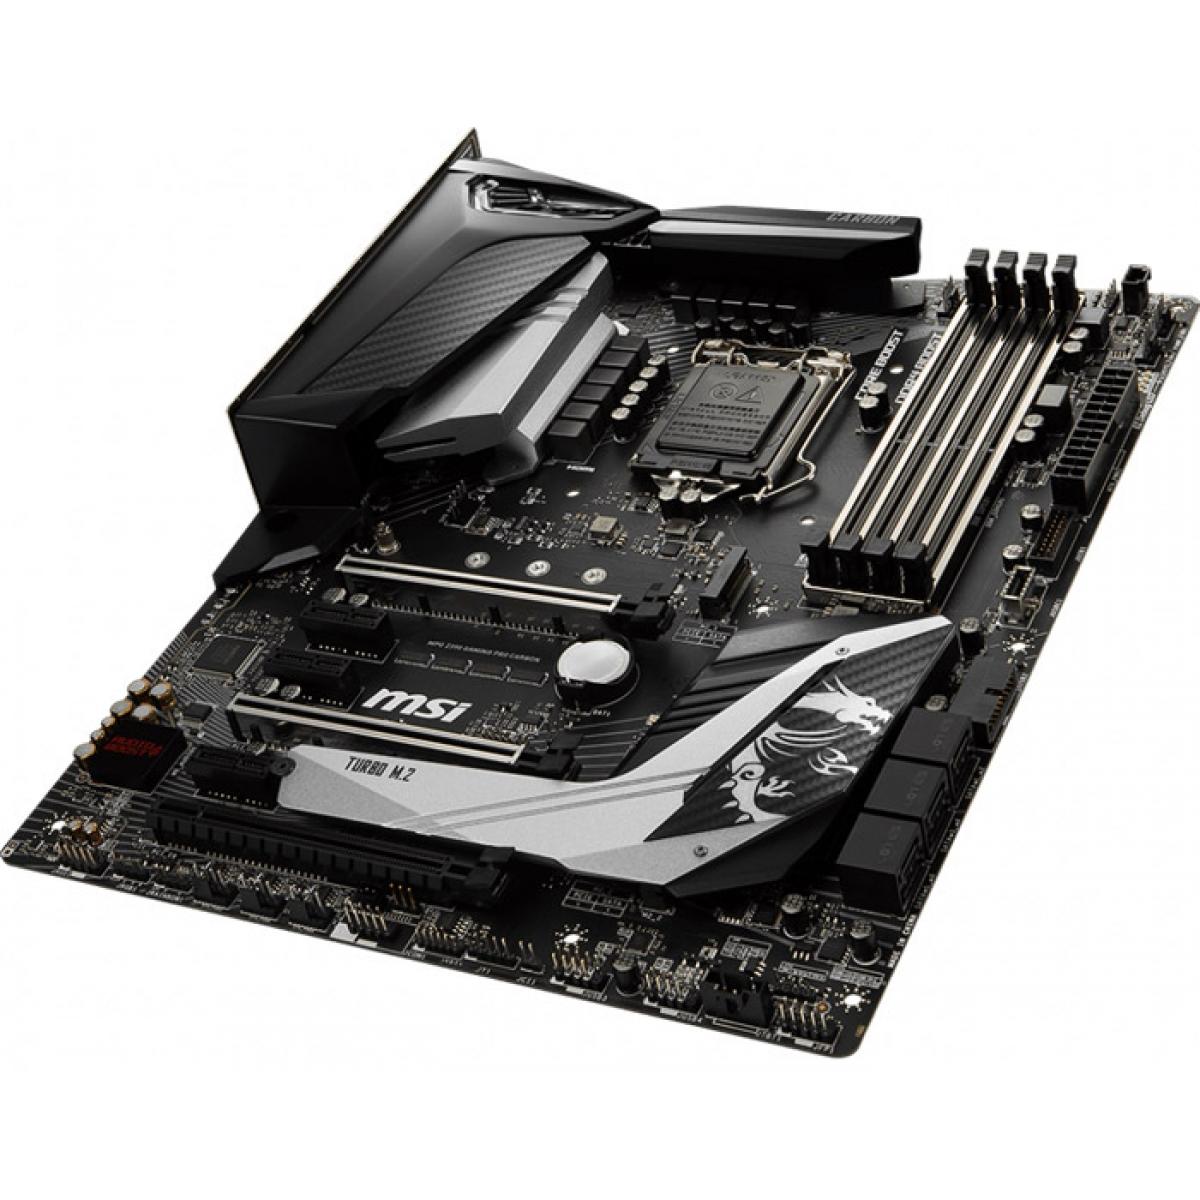 Placa Mãe MSI Z390 Mpg Gaming Pro Carbon, Chipset Z390, Intel LGA 1151, ATX, DDR4